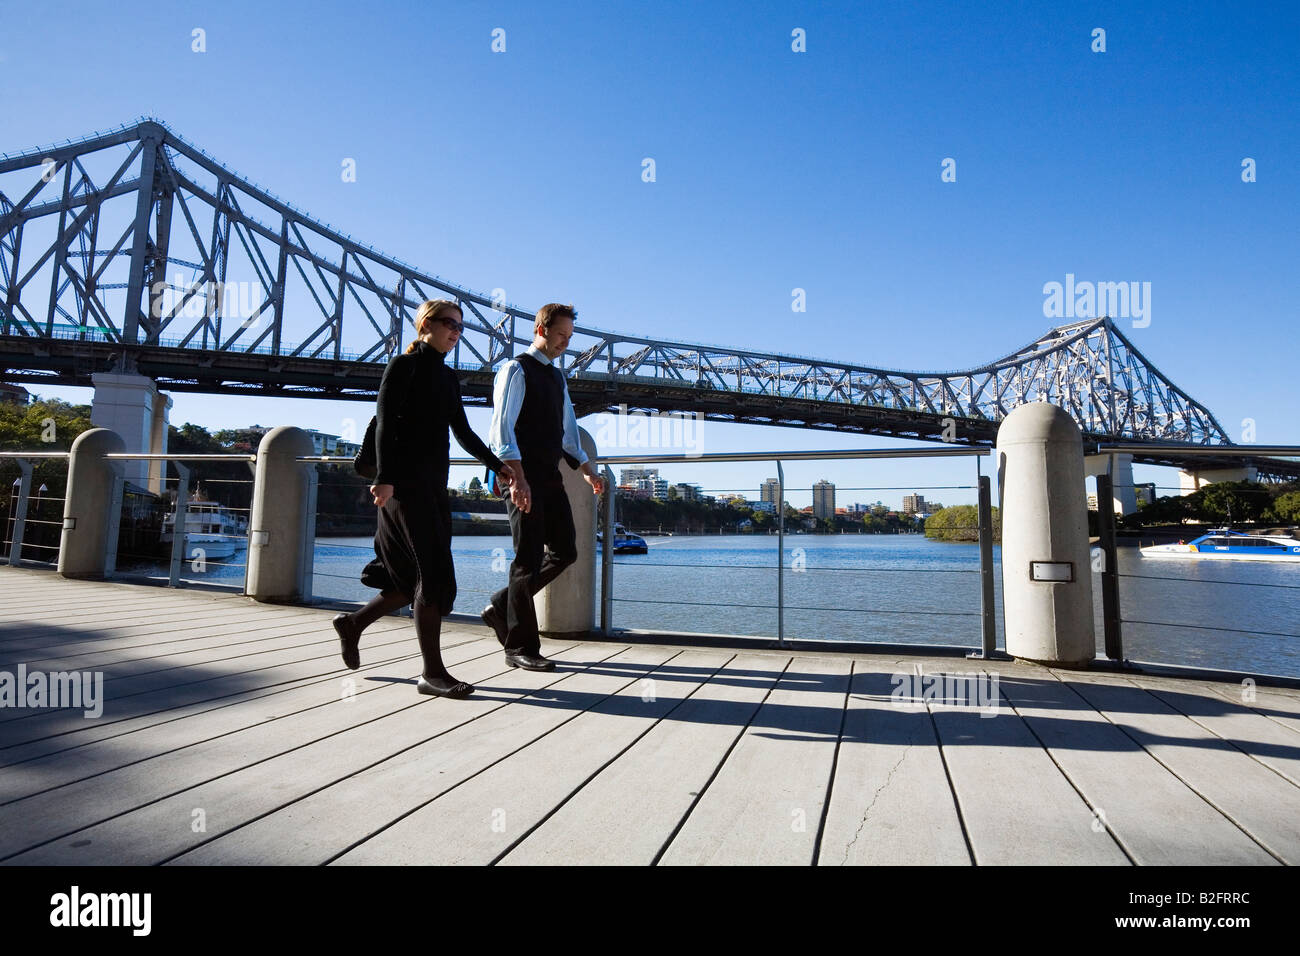 Brisbane riverside - Brisbane, Queensland, AUSTRALIA - Stock Image